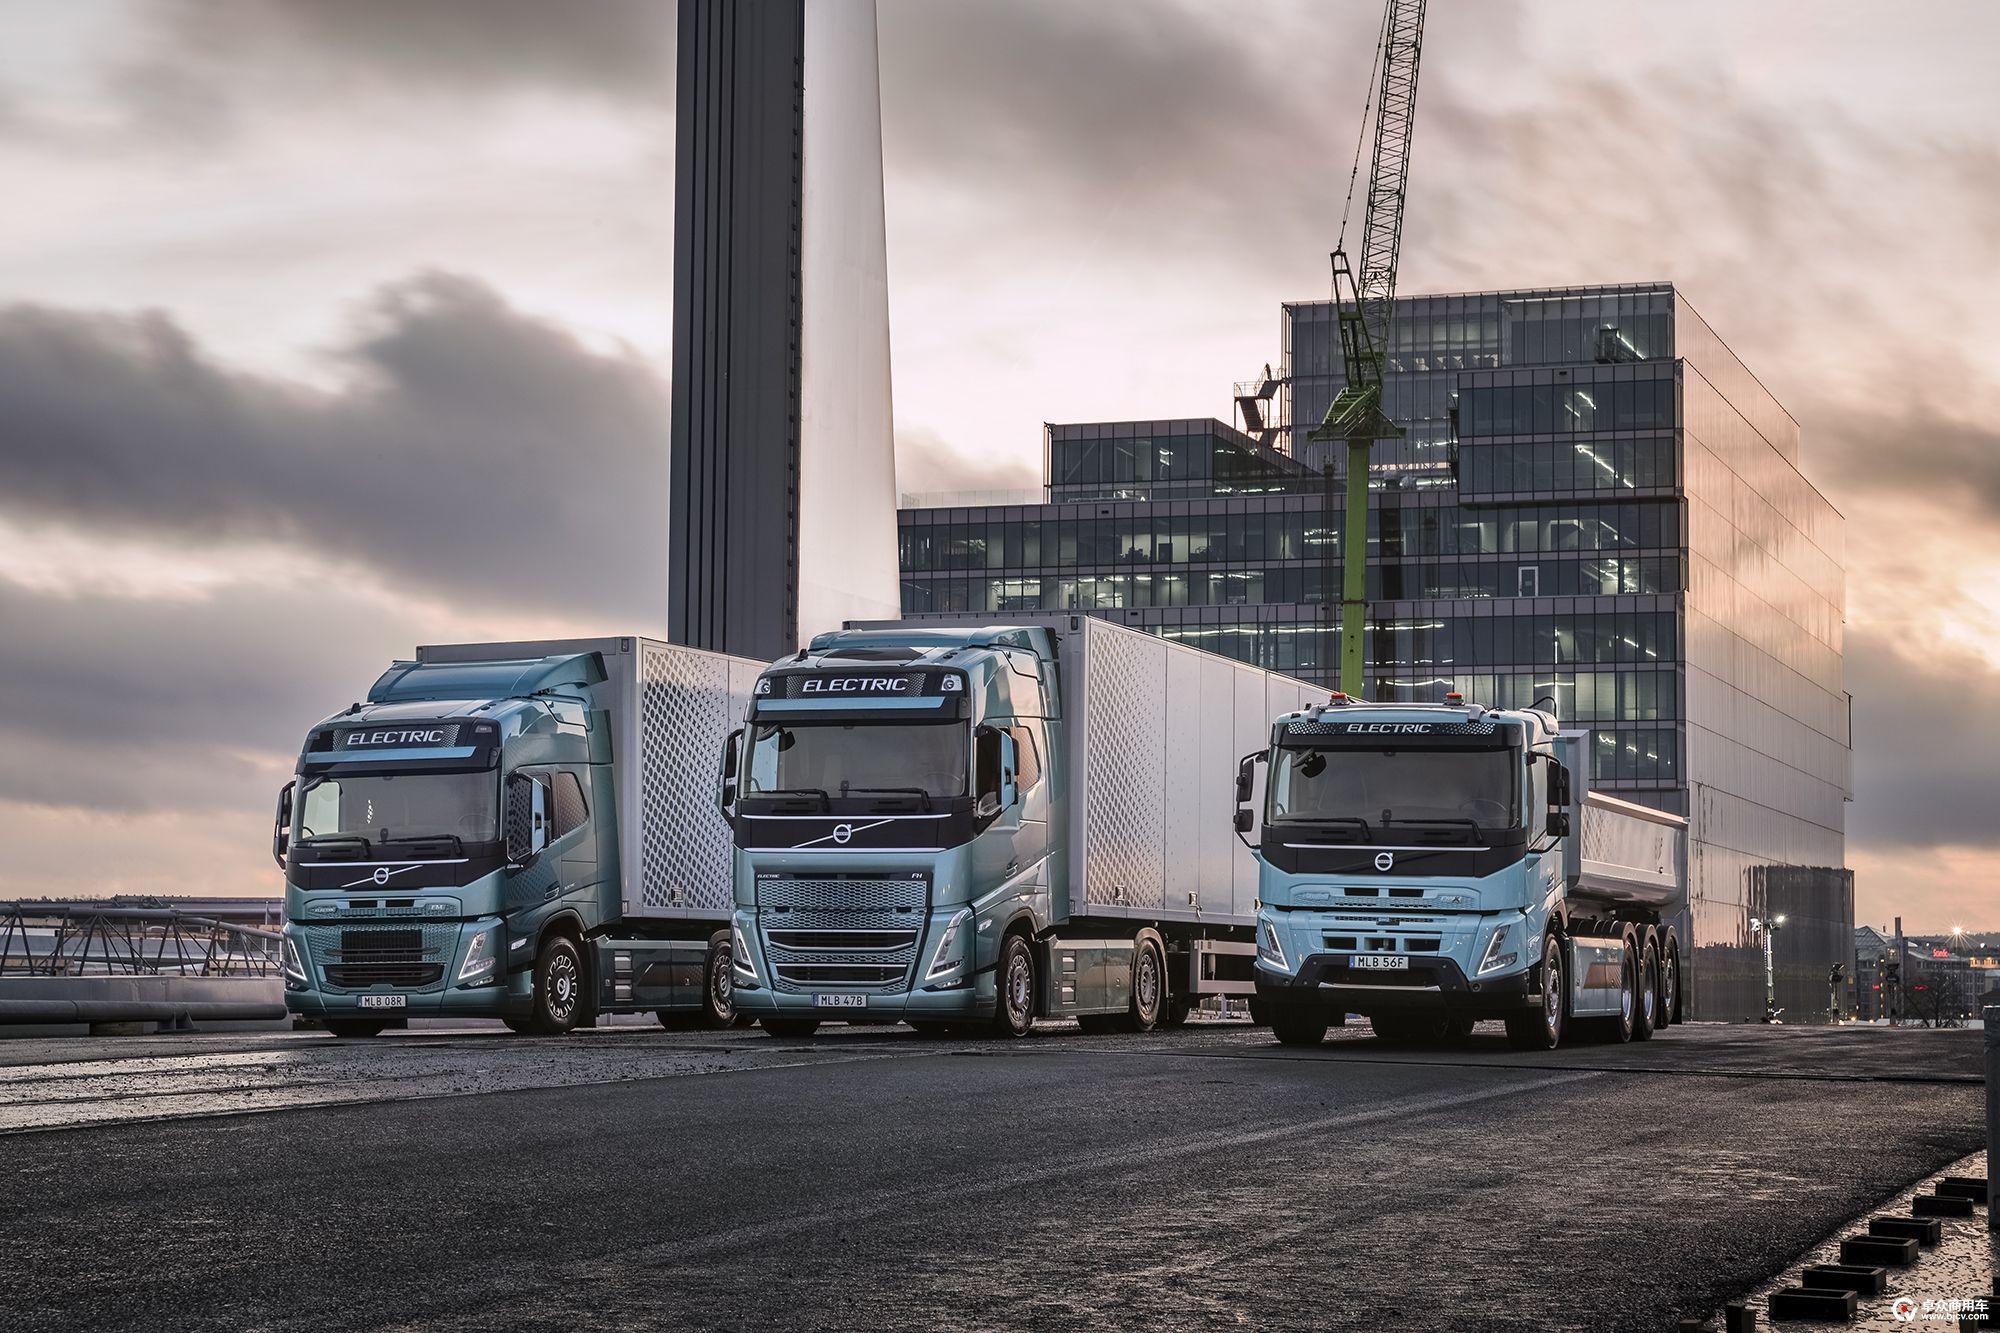 volvo-trucks-now-ready-to-electrify-image1.jpeg